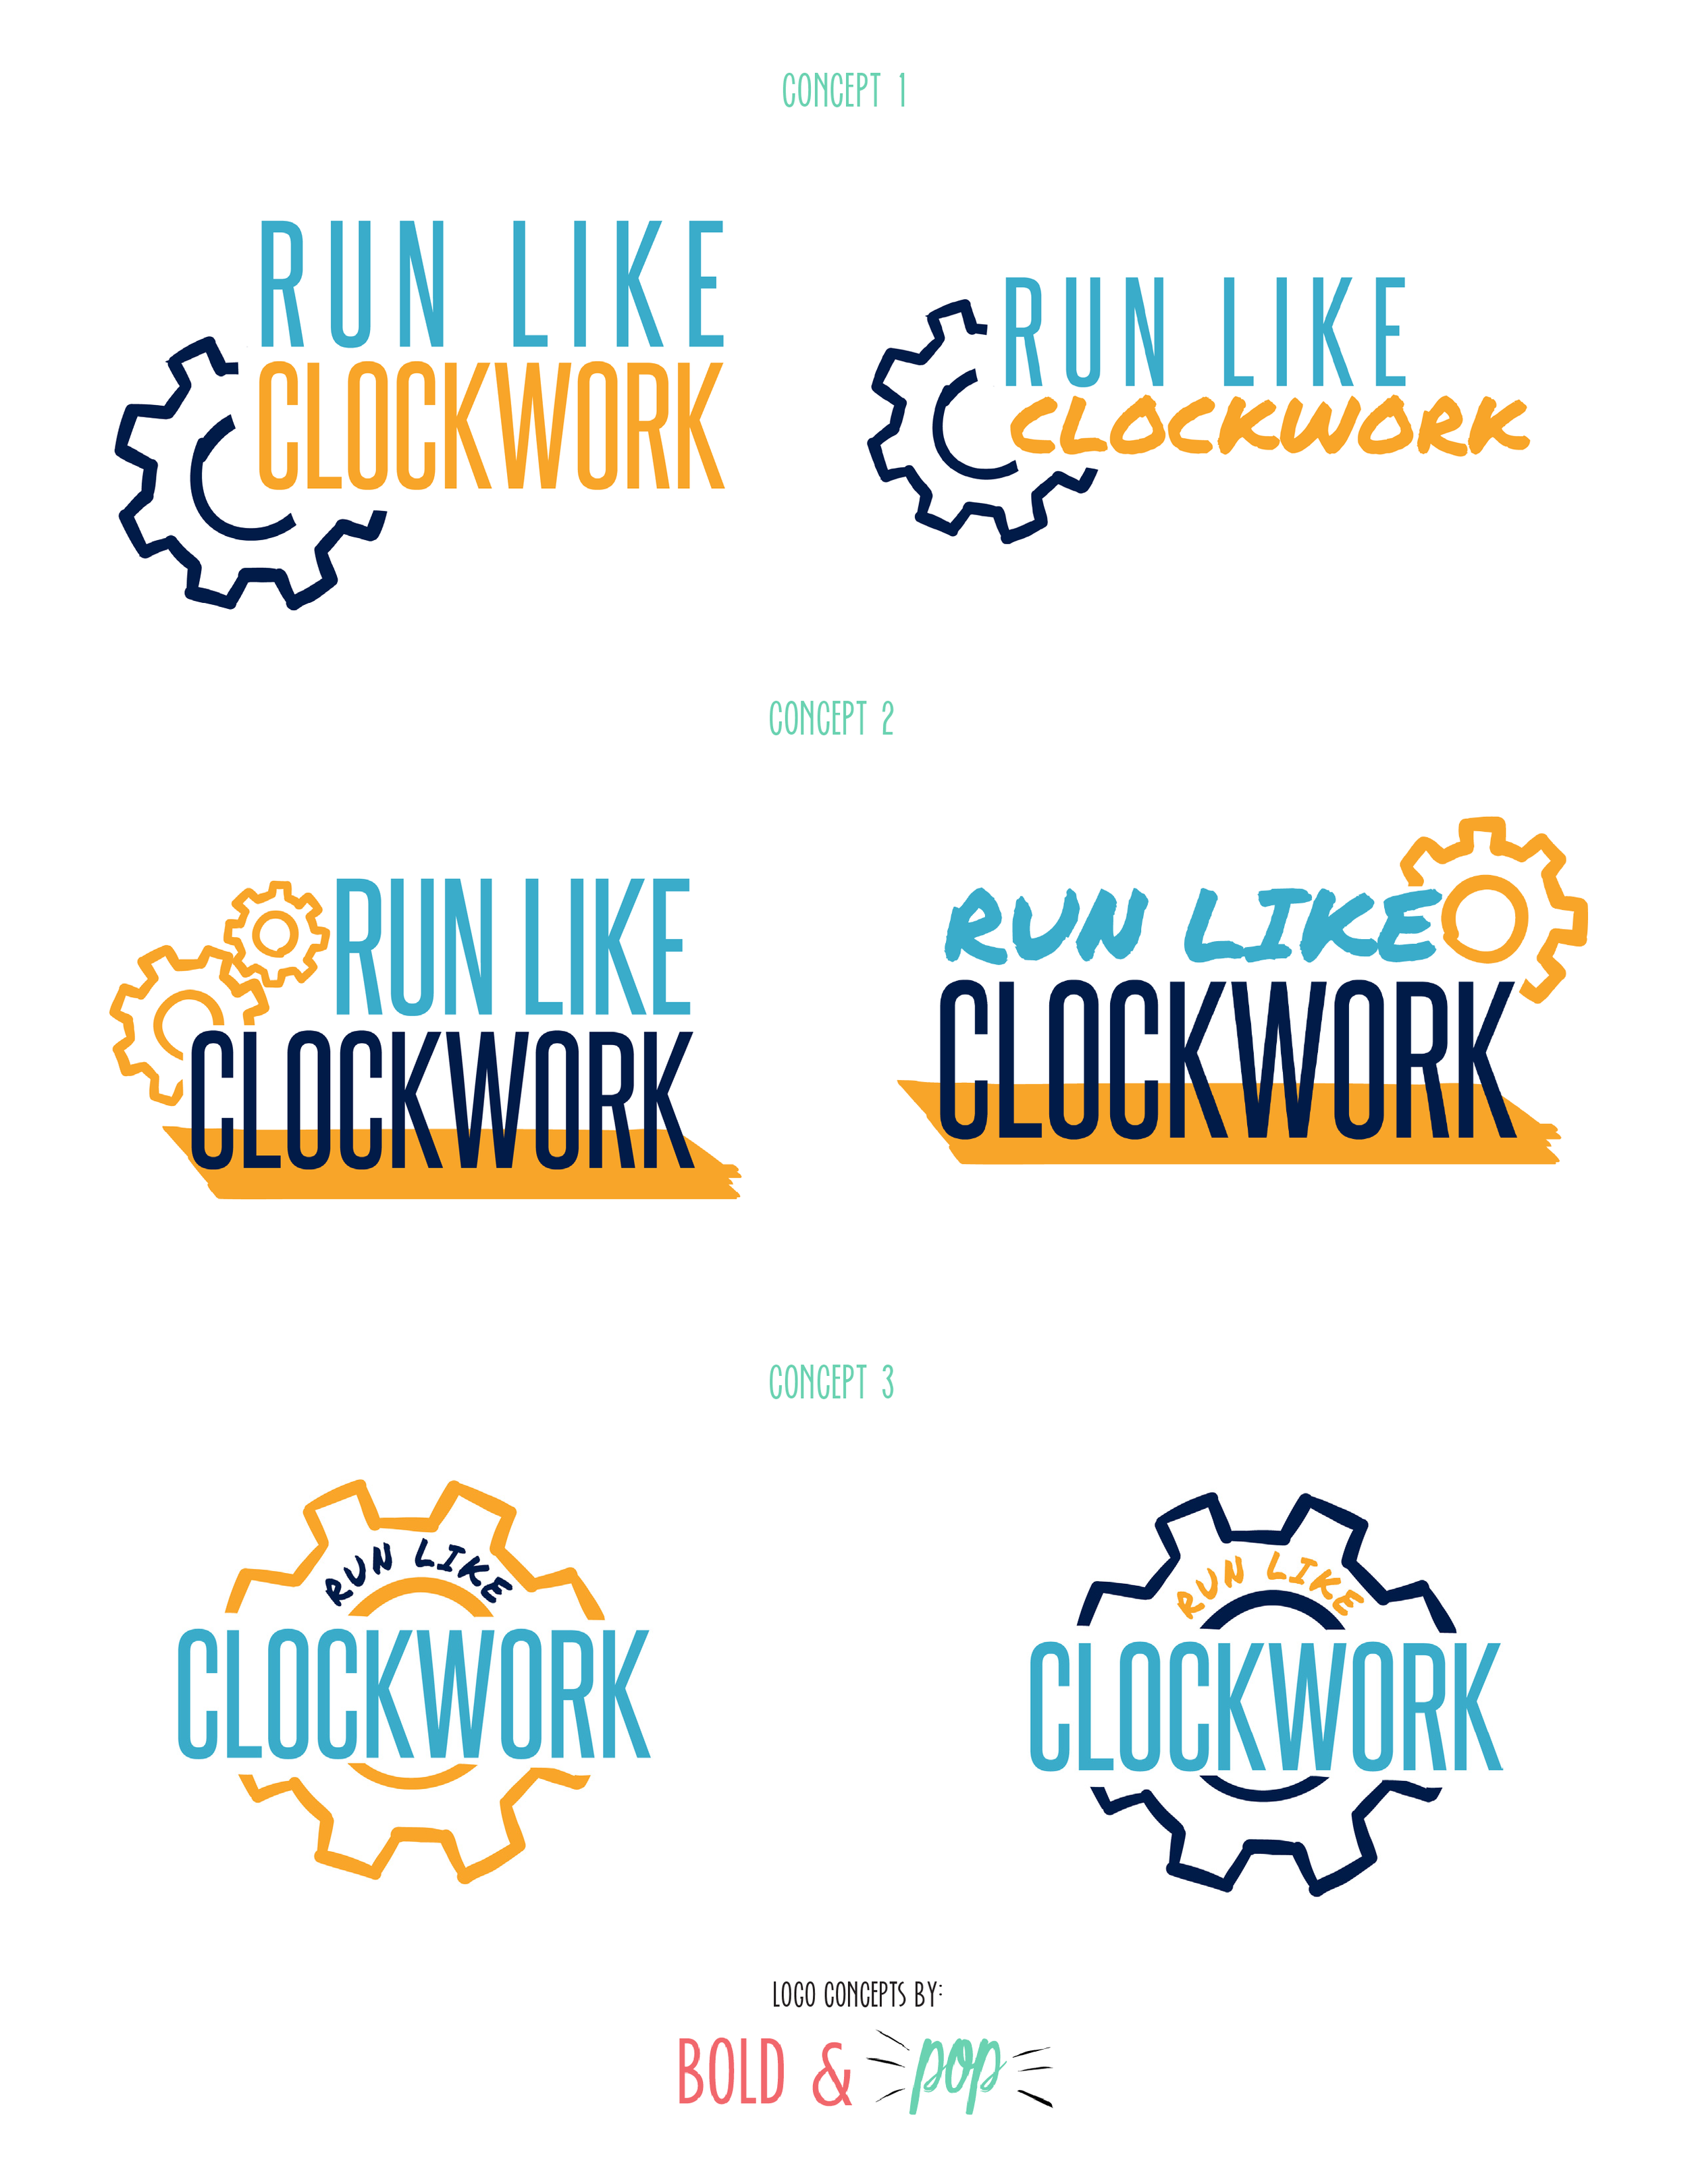 Bold & Pop : Run Like Clockwork Branding & Squarespace Website Design